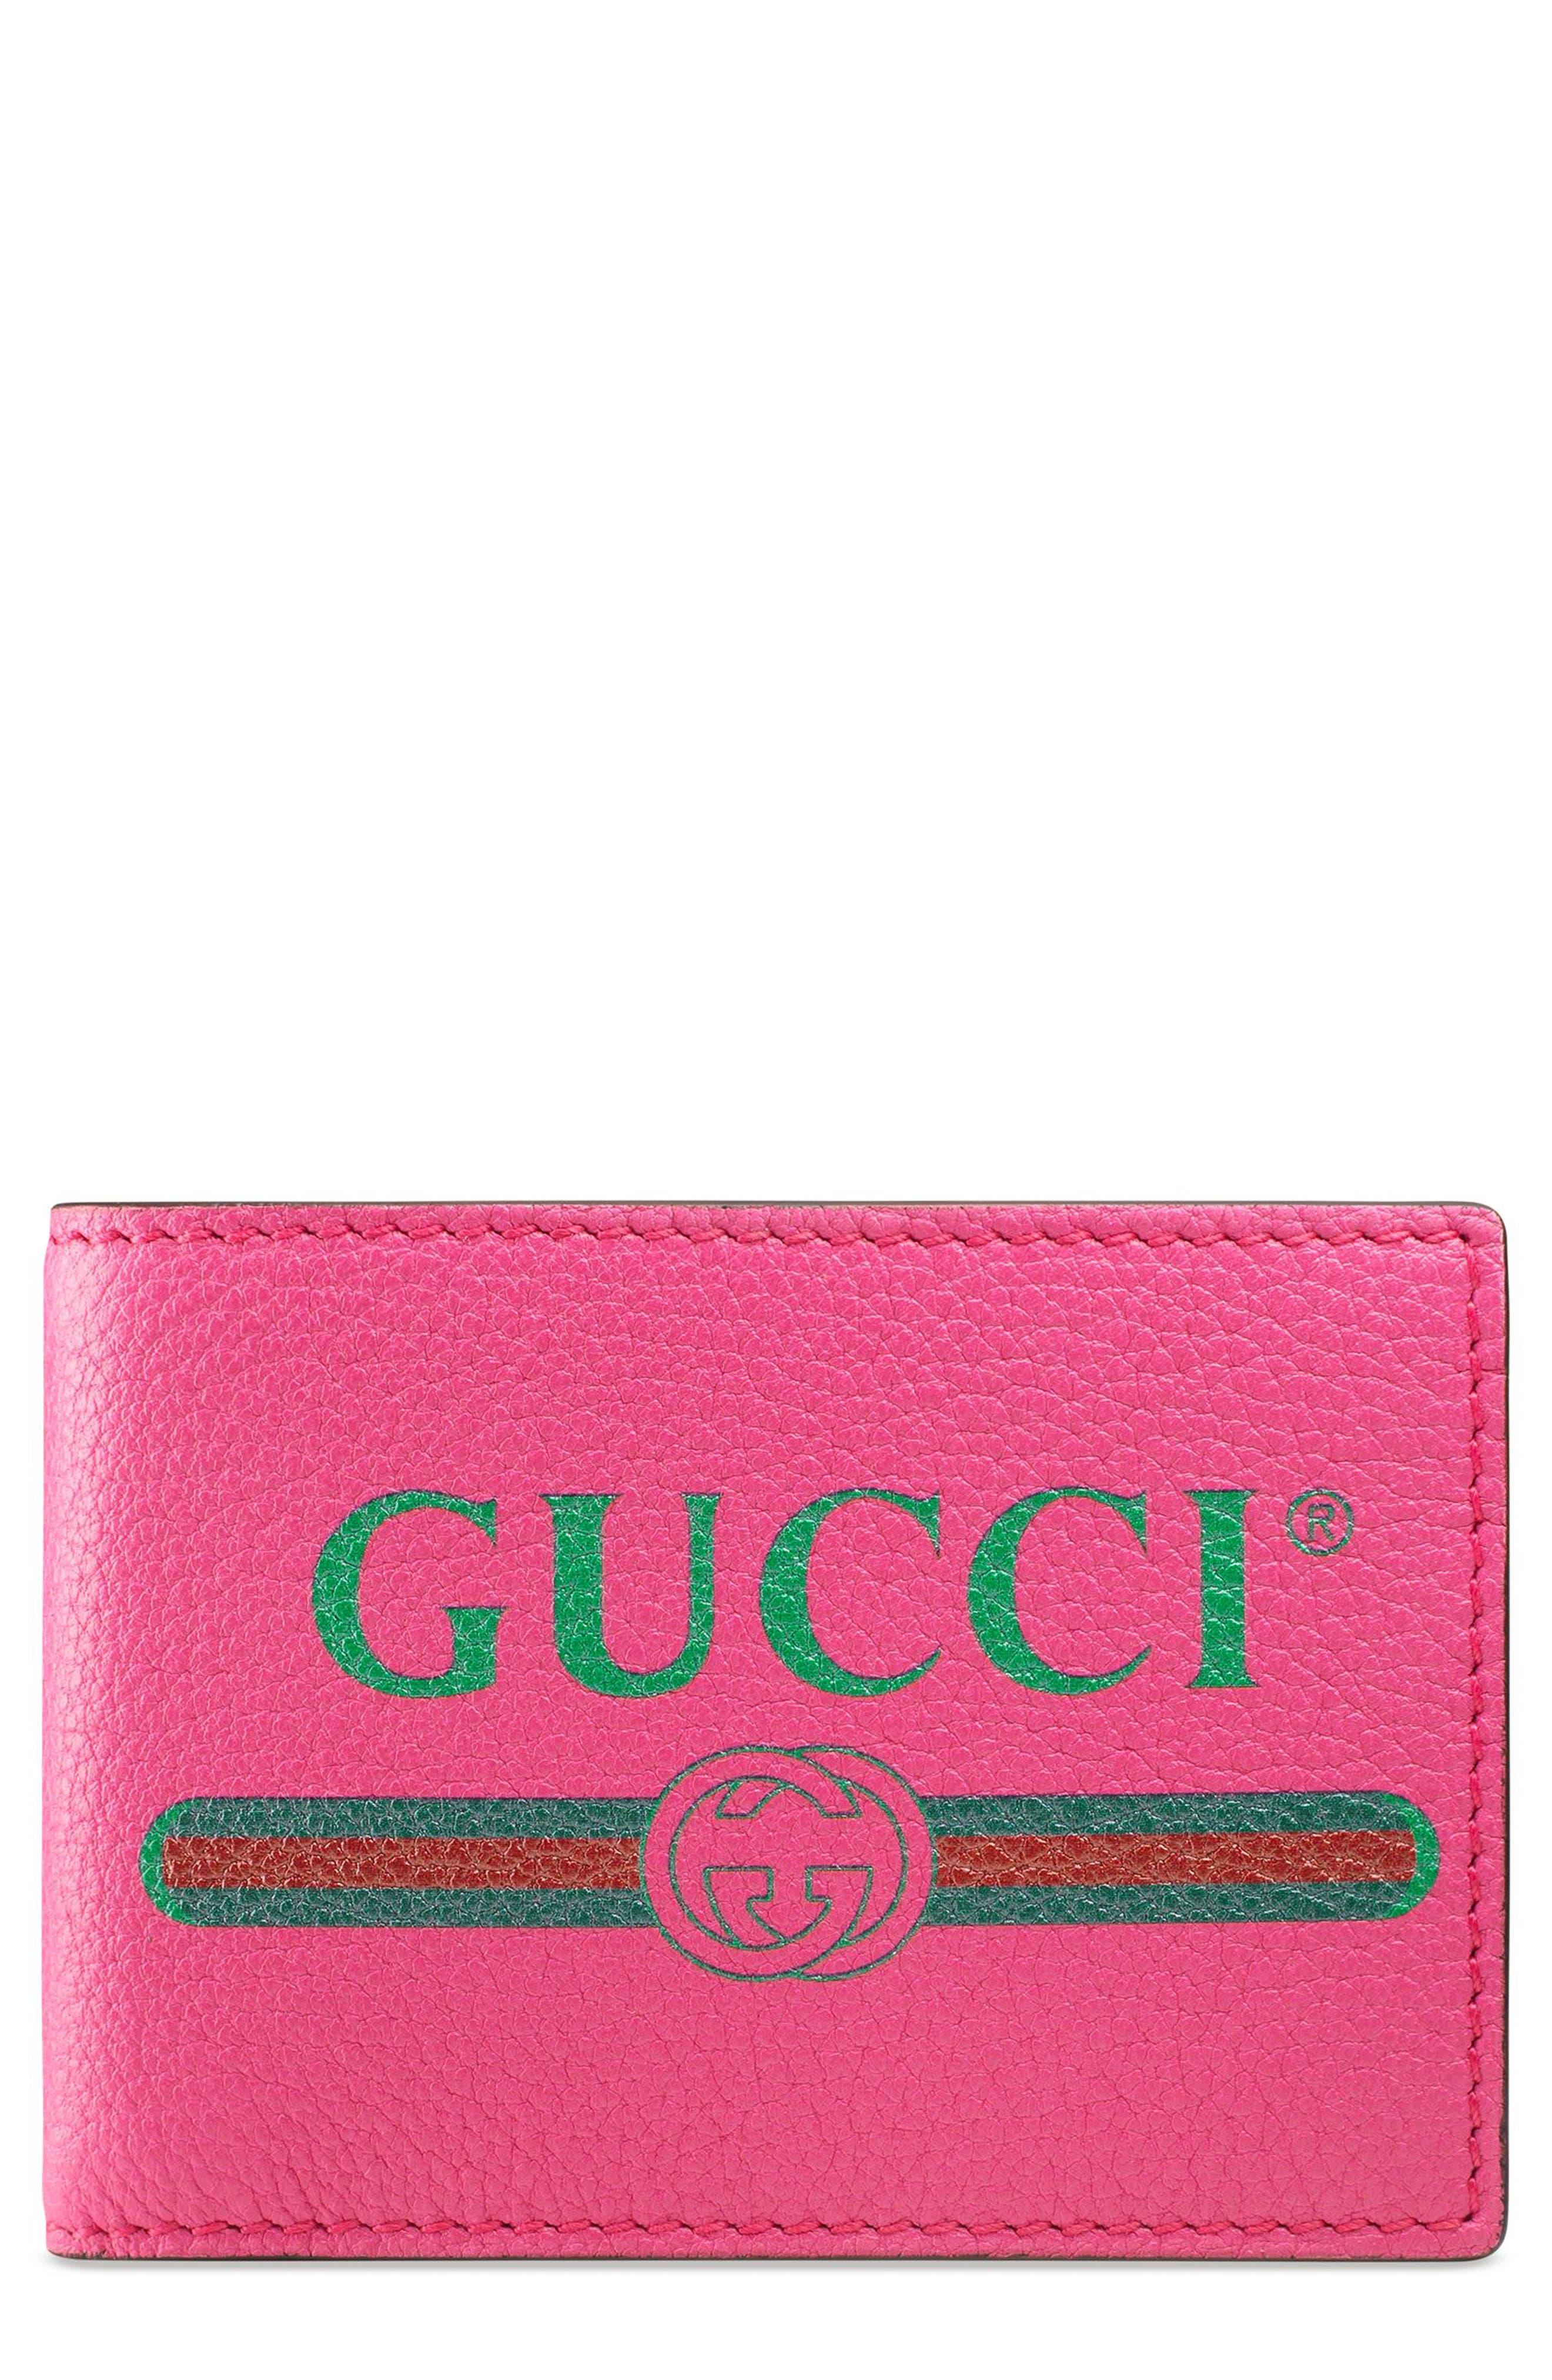 Gucci Billfold